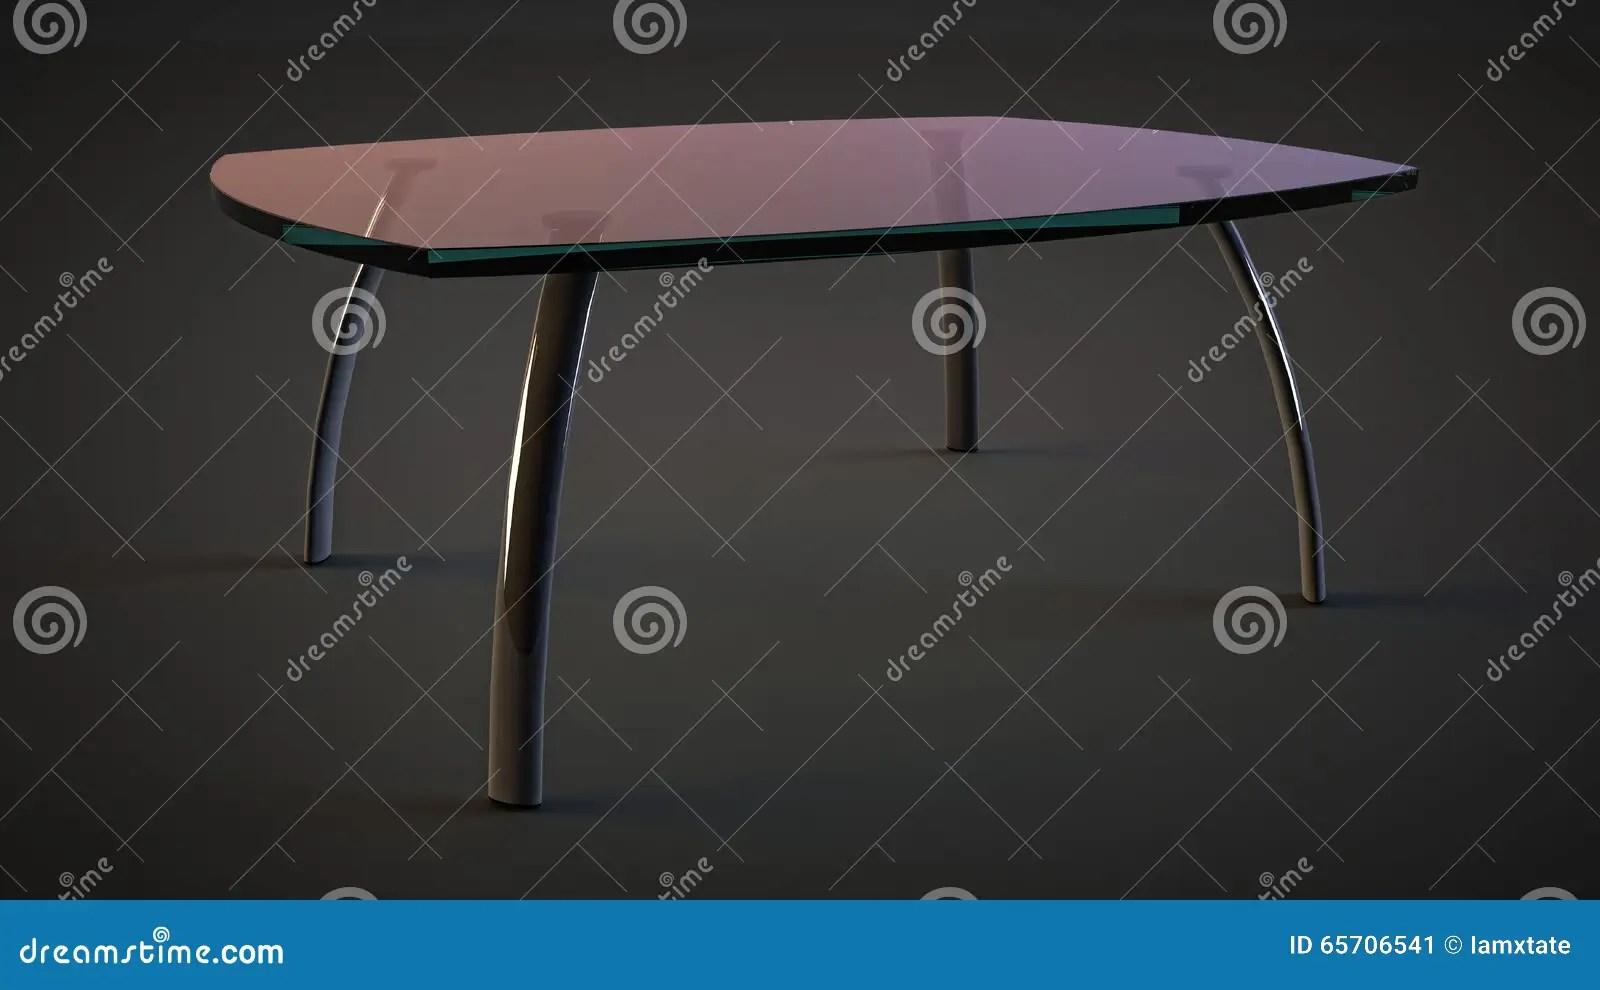 glass top kitchen table porcelain sink 玻璃桌透明顶面金属腿库存例证 插画包括有垫座 翻译 唯一 射击 设计 与透明上面和金属腿的玻璃桌在黑暗的背景的室内家庭家具